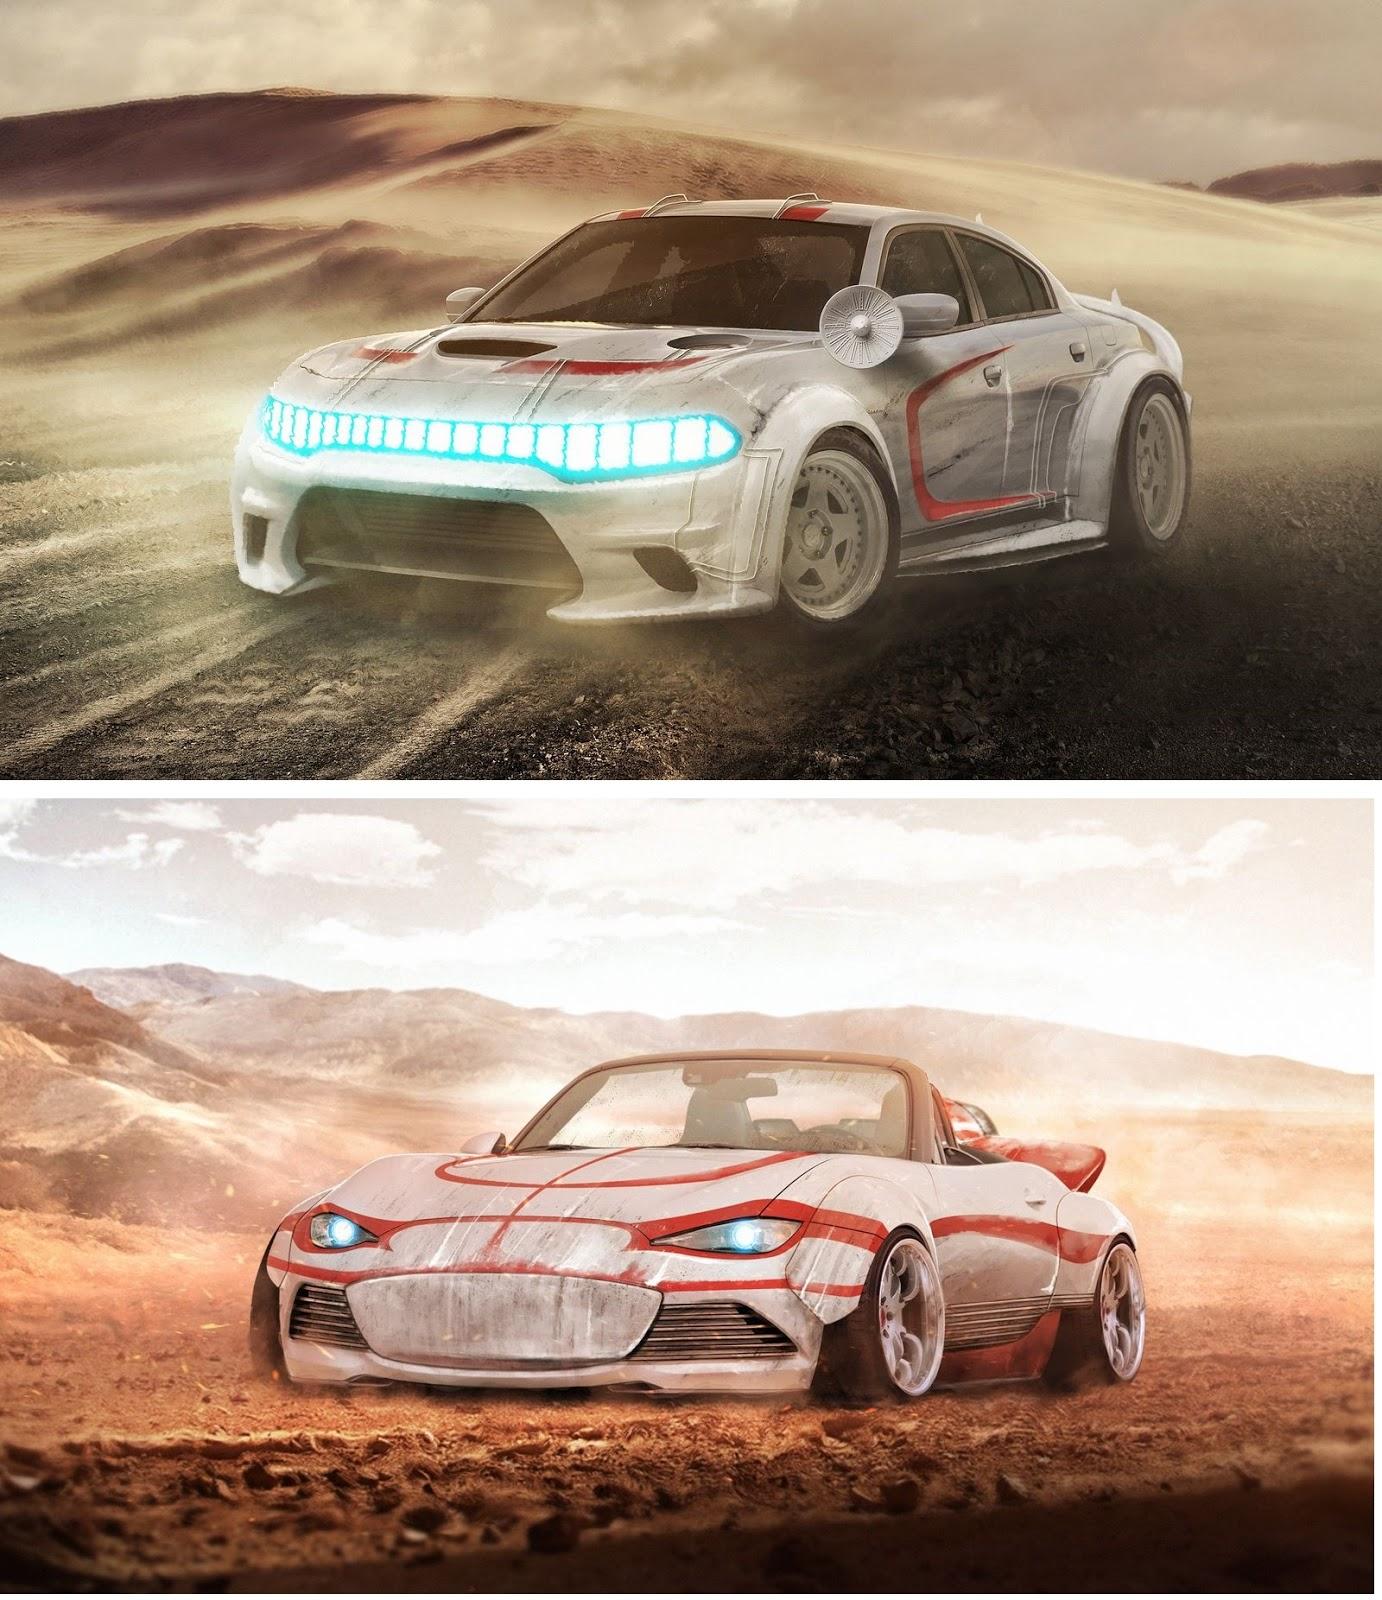 Han-Solo-Luke-Skywalker Extraordinary Lamborghini Countach Schwer Zu Fahren Cars Trend